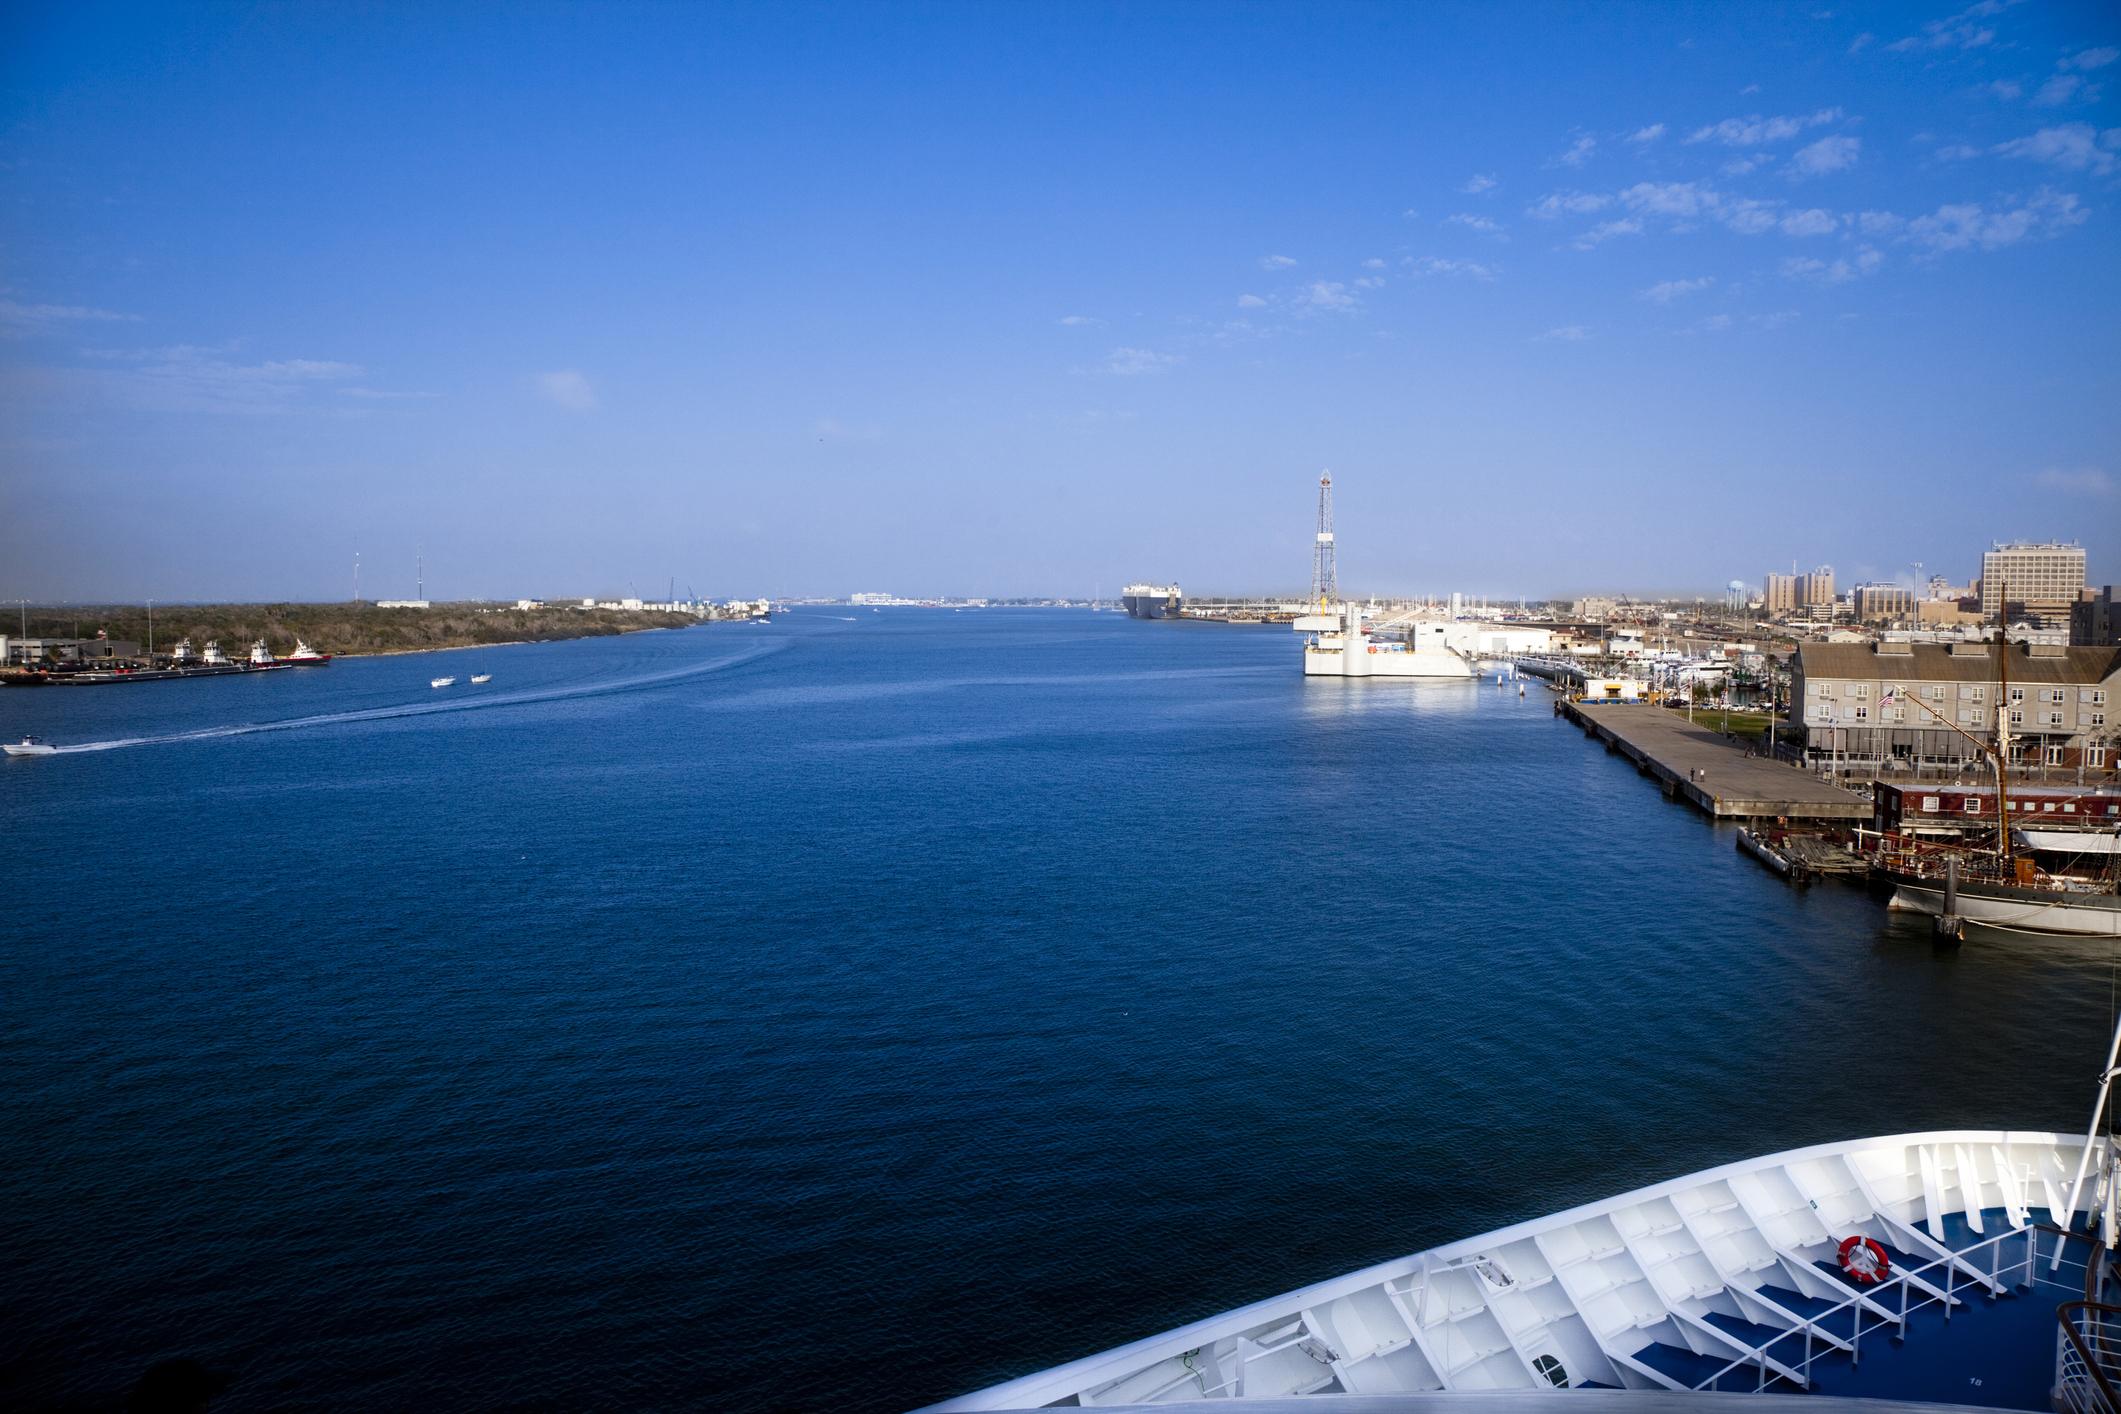 All Inclusive Cruises >> All Inclusive Cruises Out Of Galveston Lovetoknow